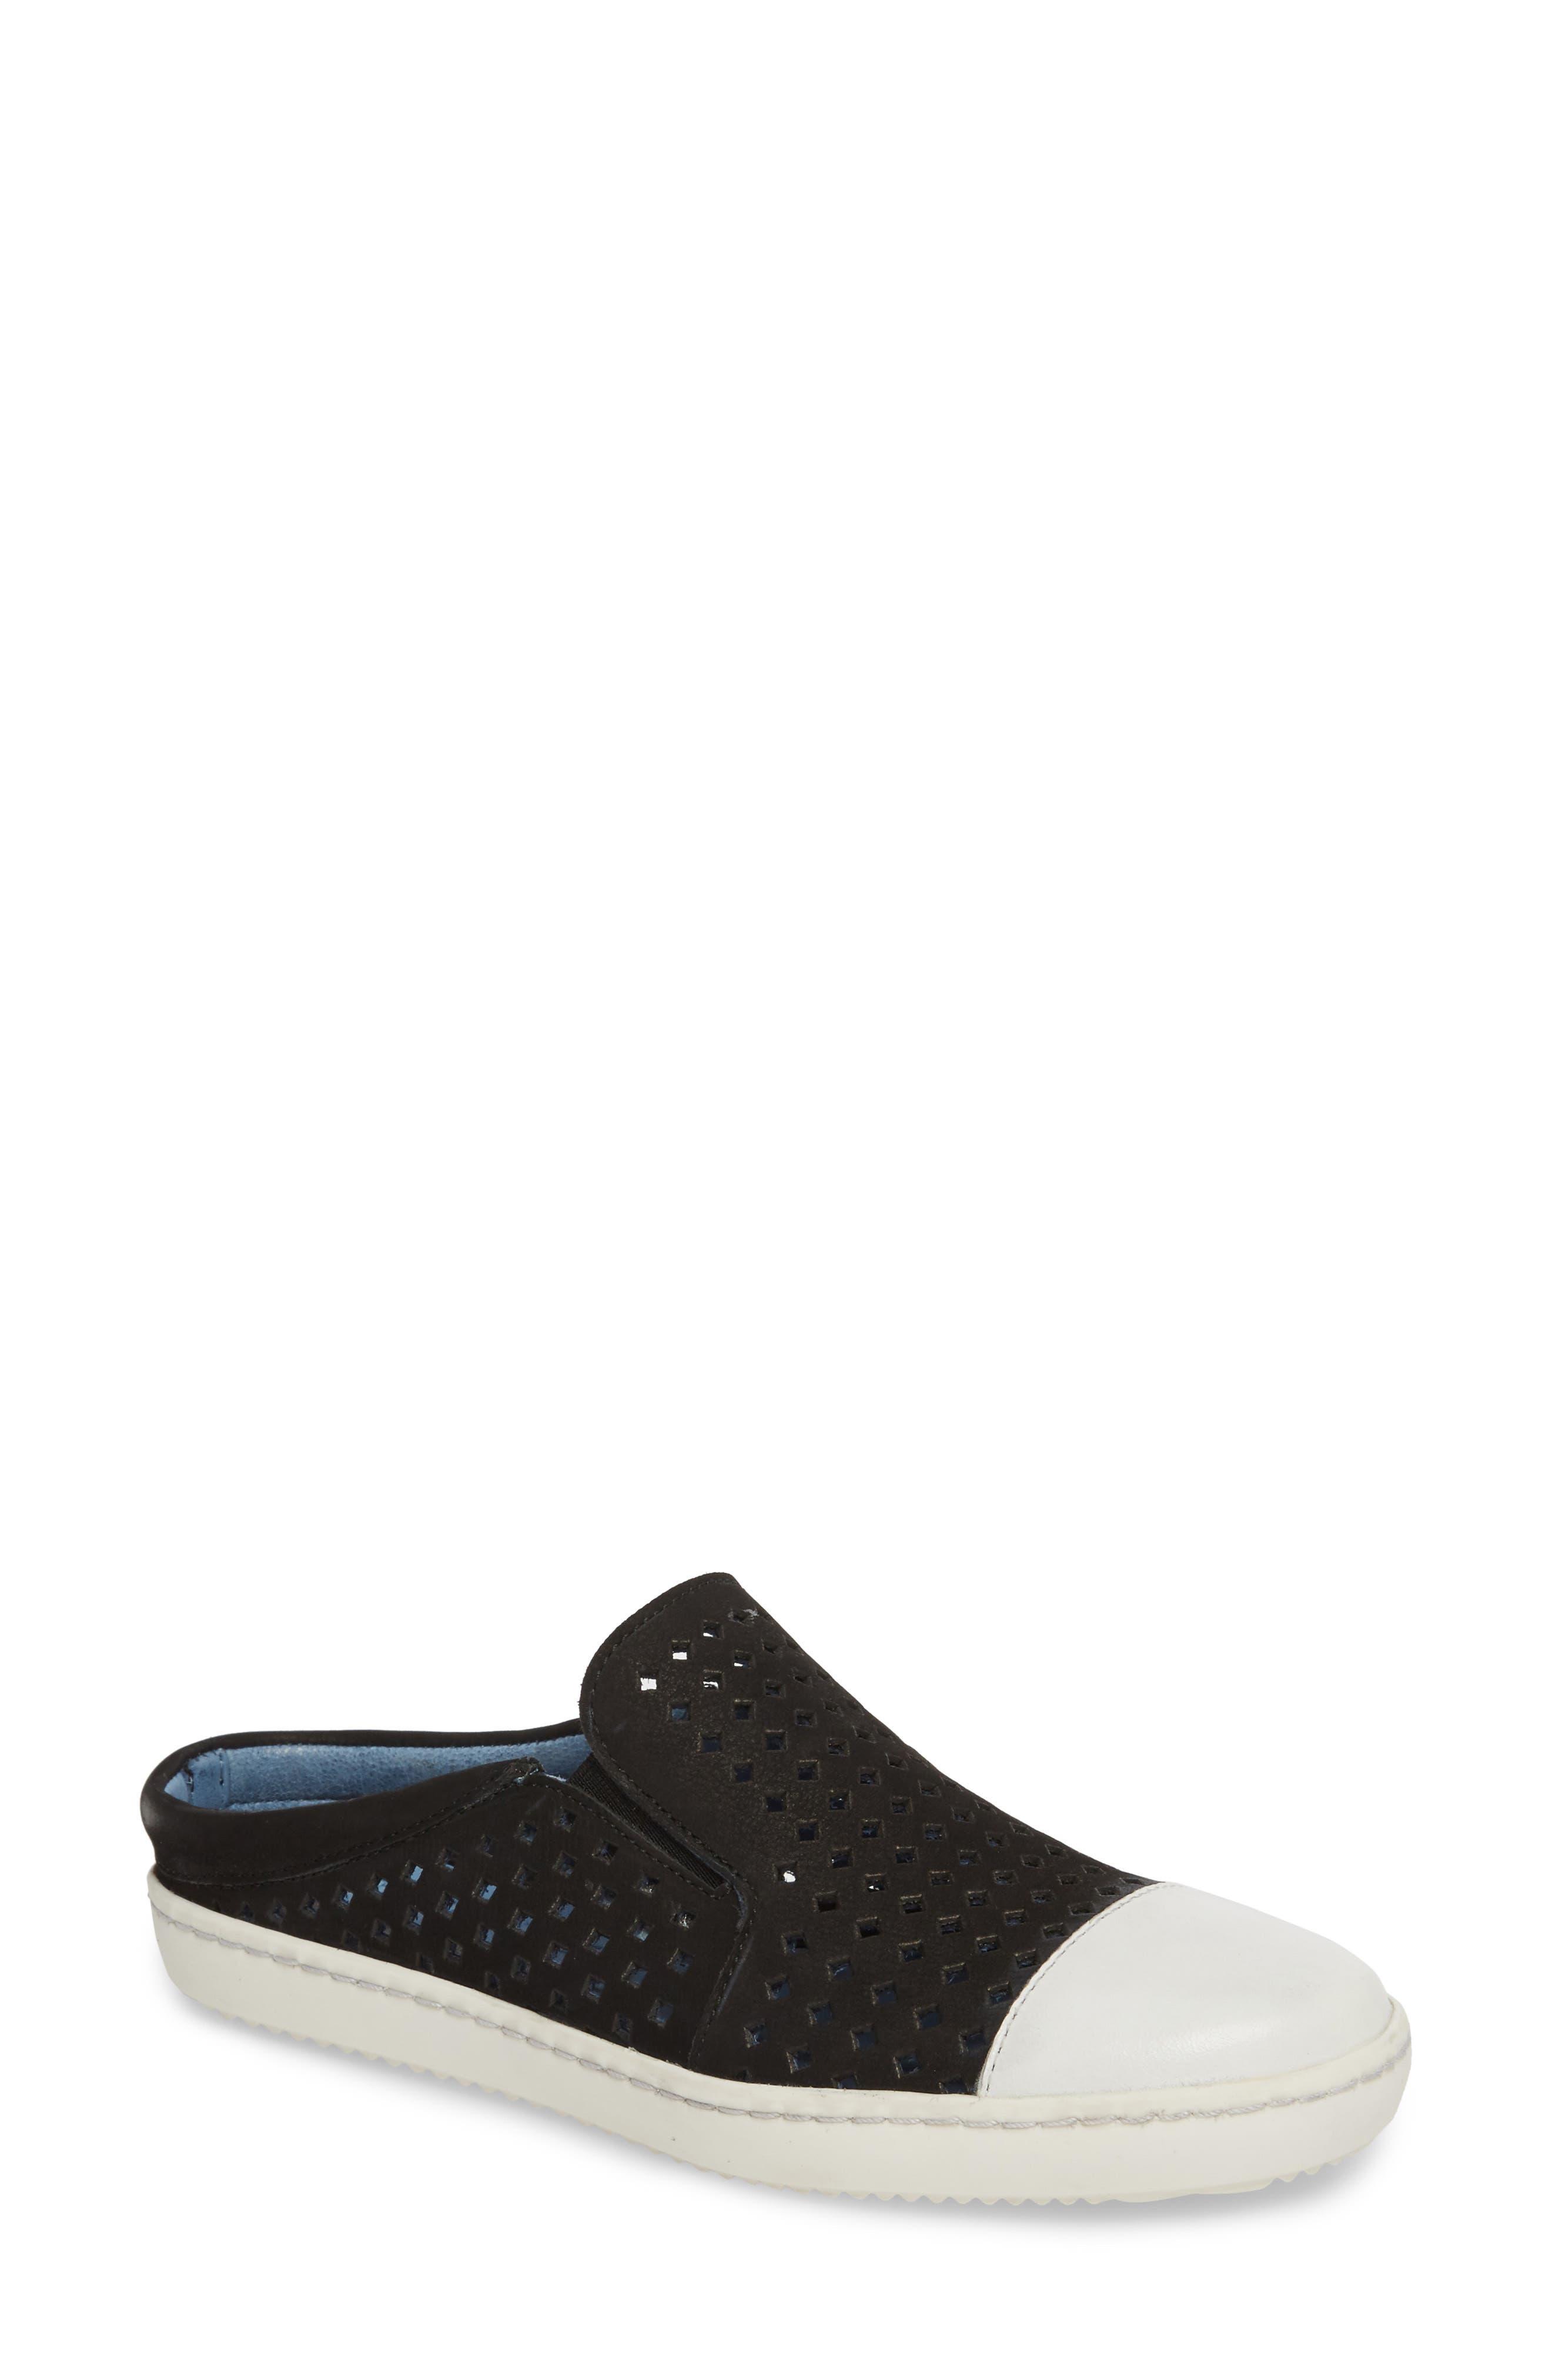 Tippy Slip-On Sneaker,                             Main thumbnail 1, color,